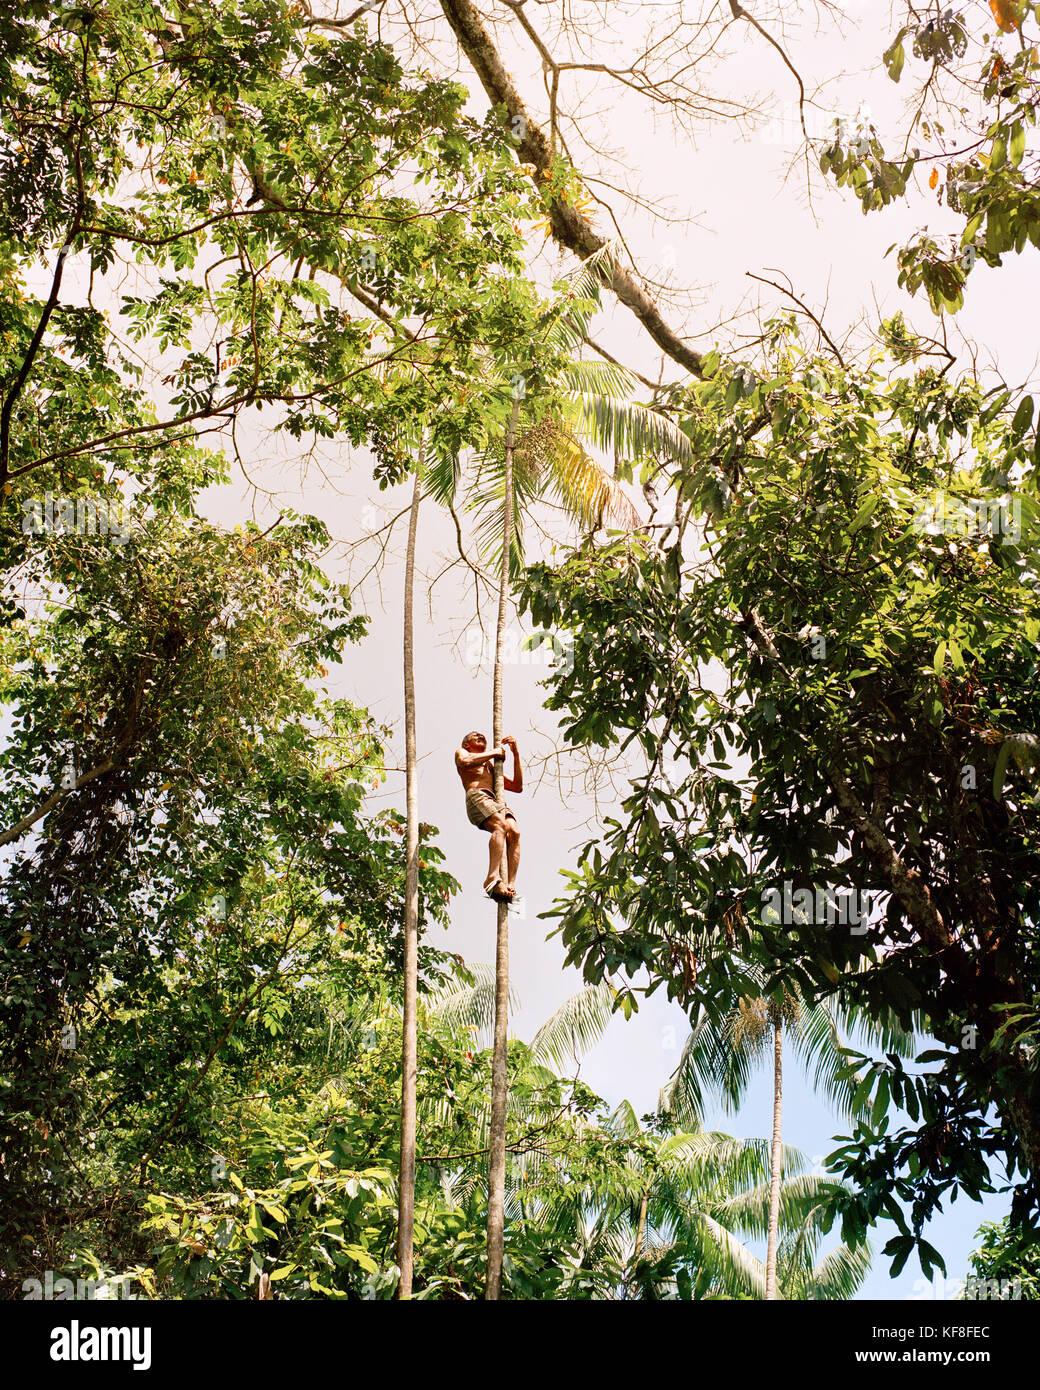 Brazil, Belem, South America, man climbs Acai palms to gather fruit in the Amazon Jungle - Stock Image